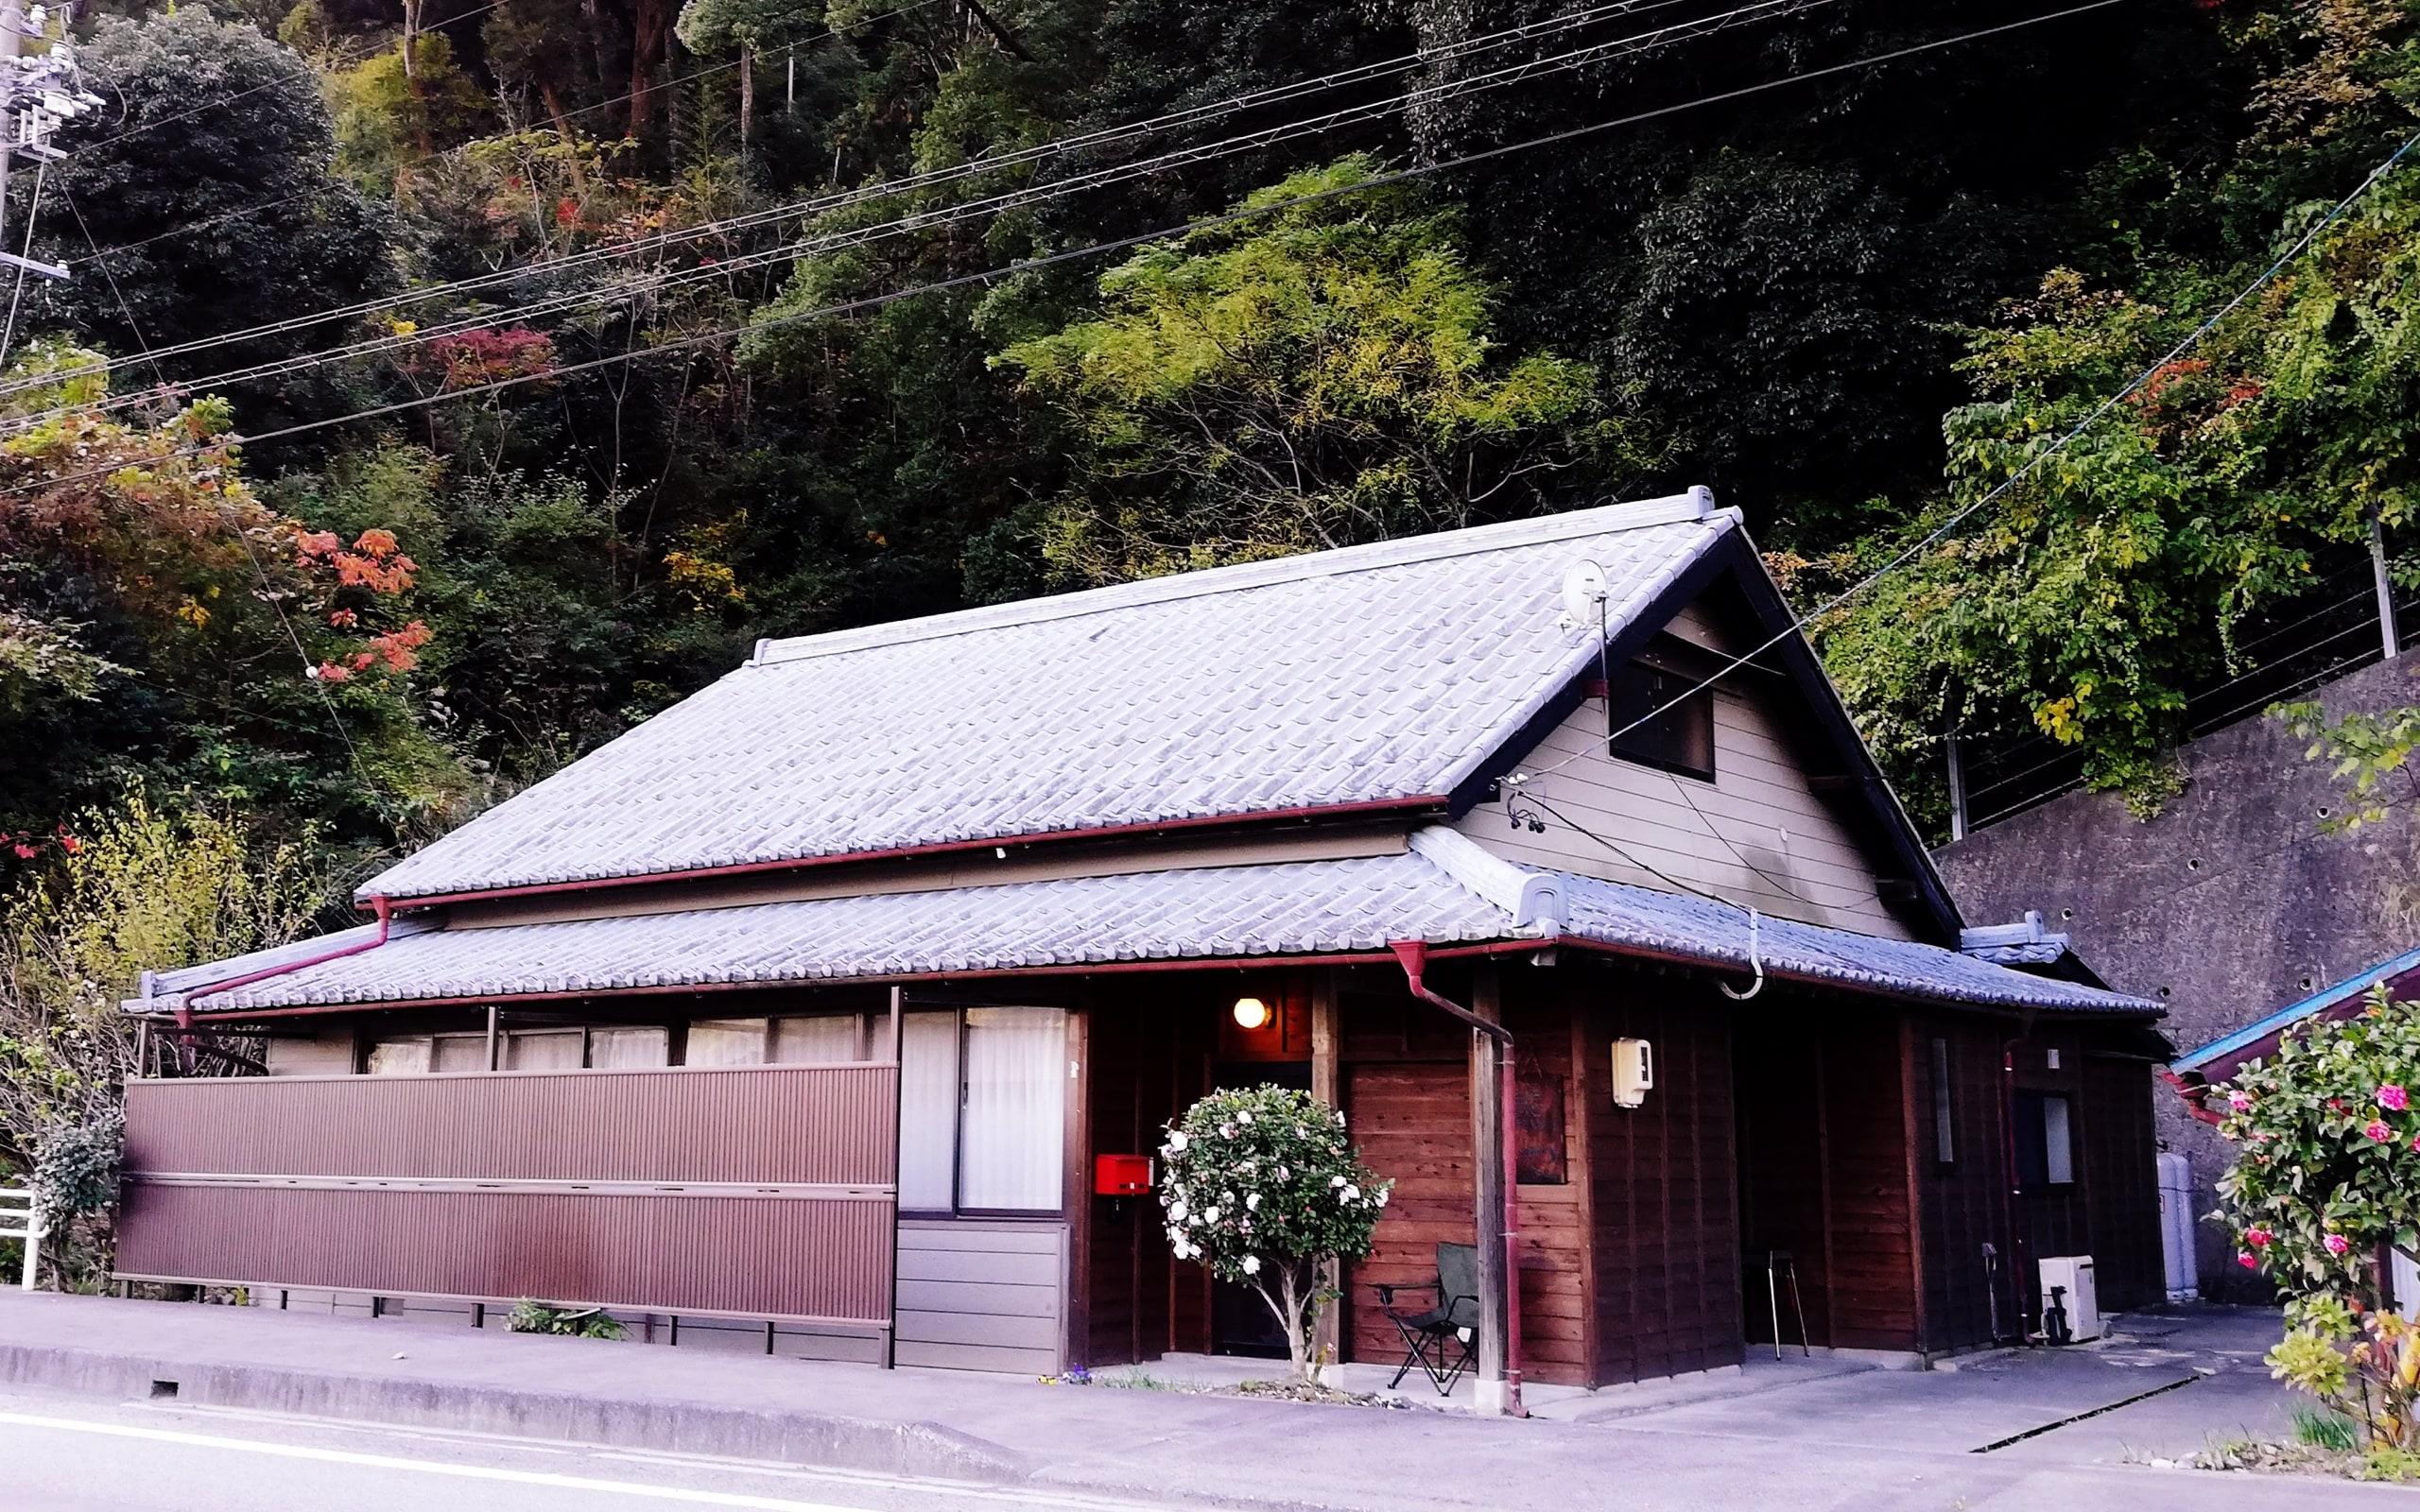 kumanoya 01@2x   Workations(ワーケーションズ)